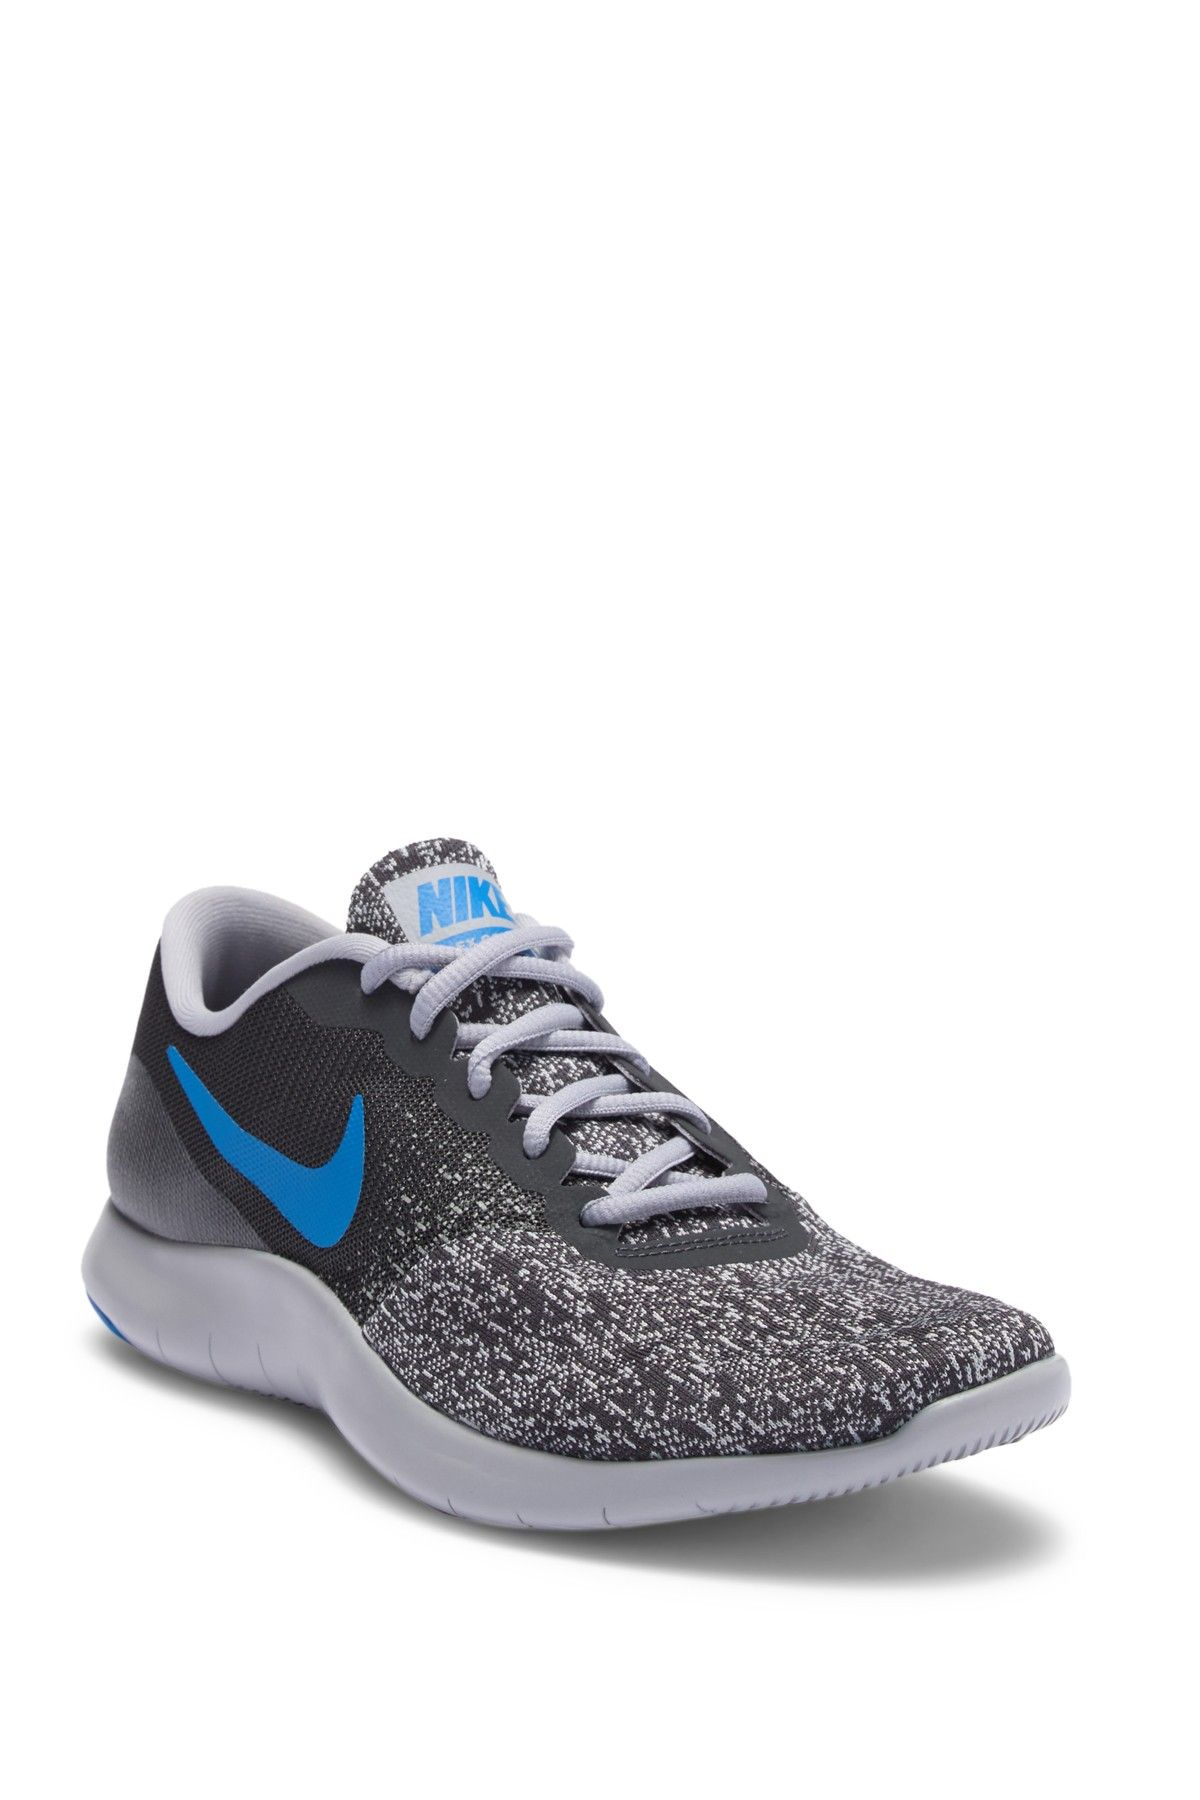 Sneakers & Tennis Shoes for Women | Nordstrom Rack